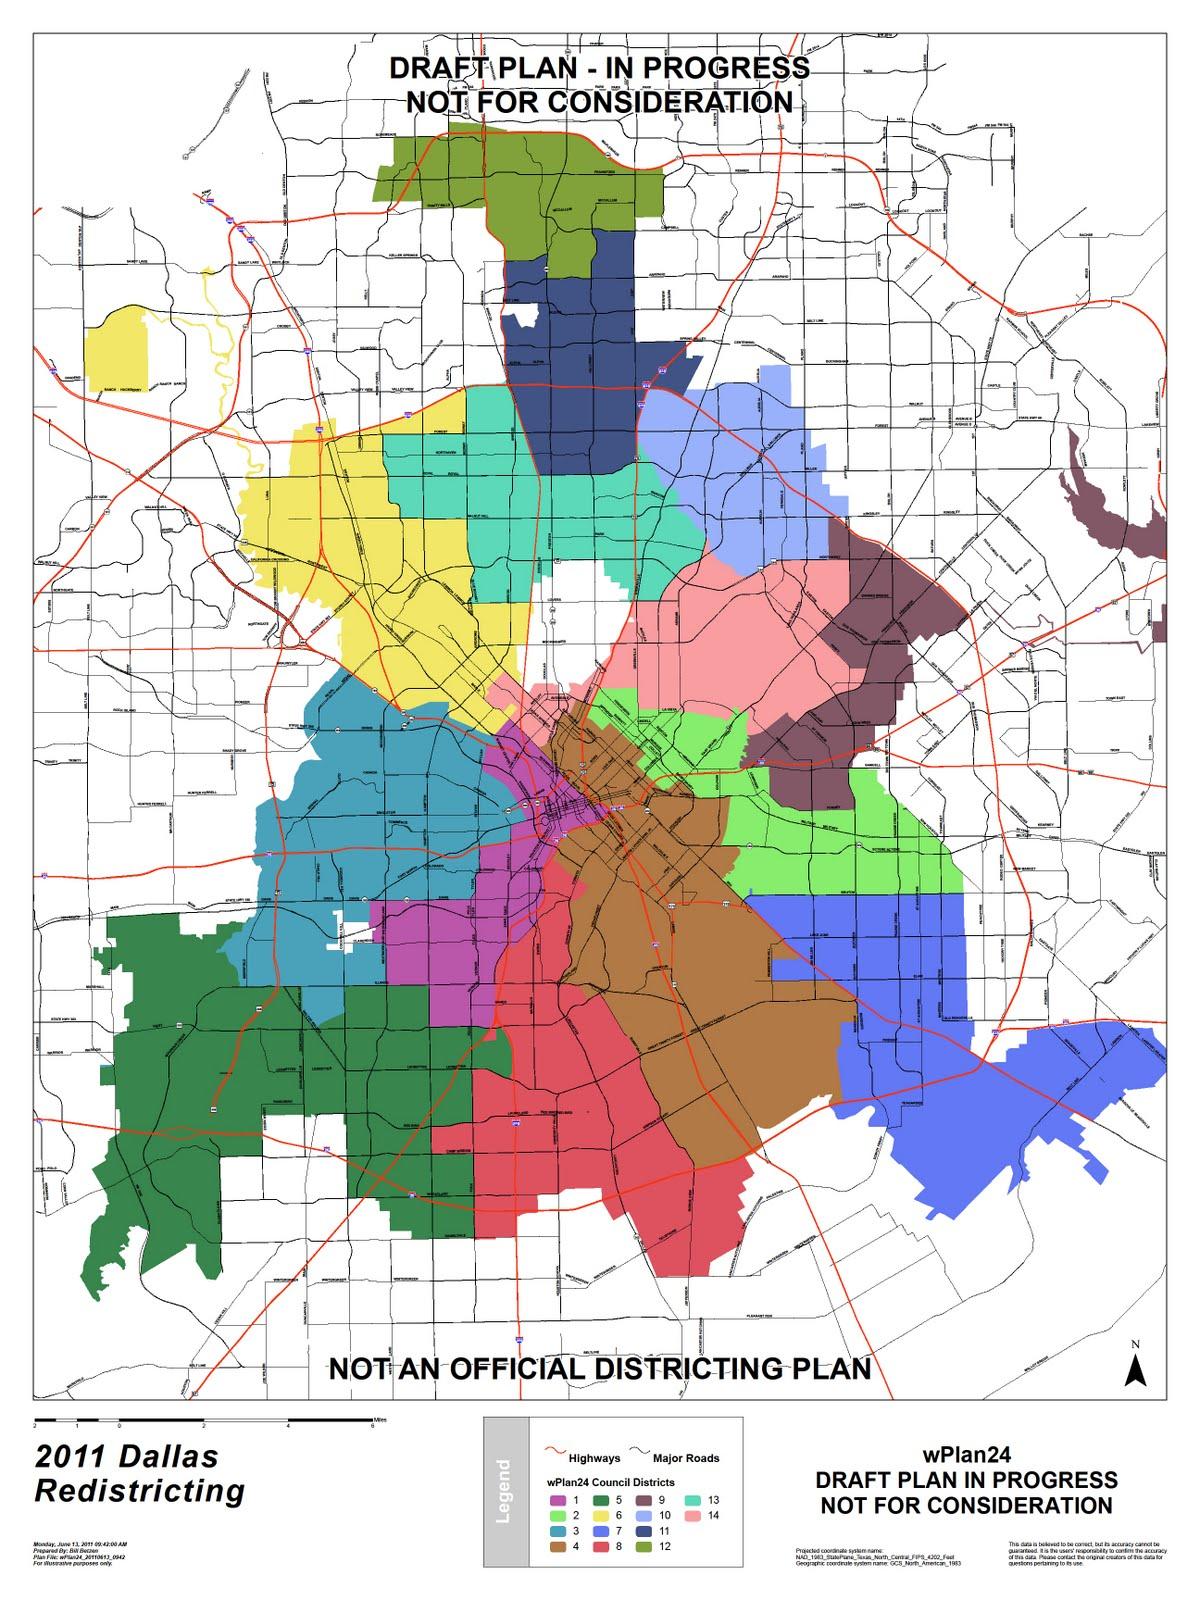 Dallas Redistricting 2011: Fourth Dallas City Council Redistricting on